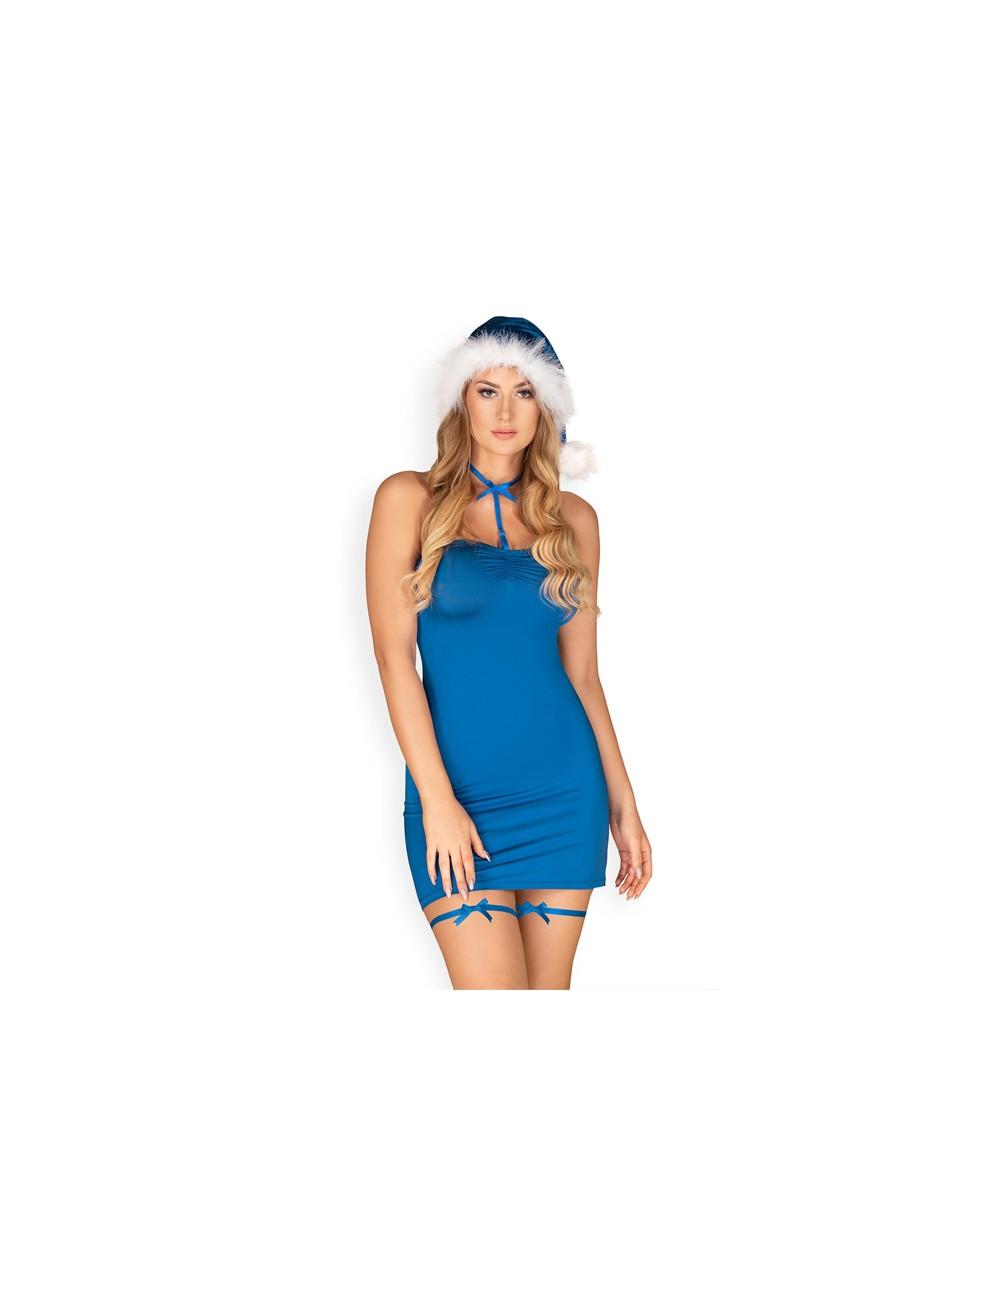 Nuisette Kissmas Bleu Obsessive